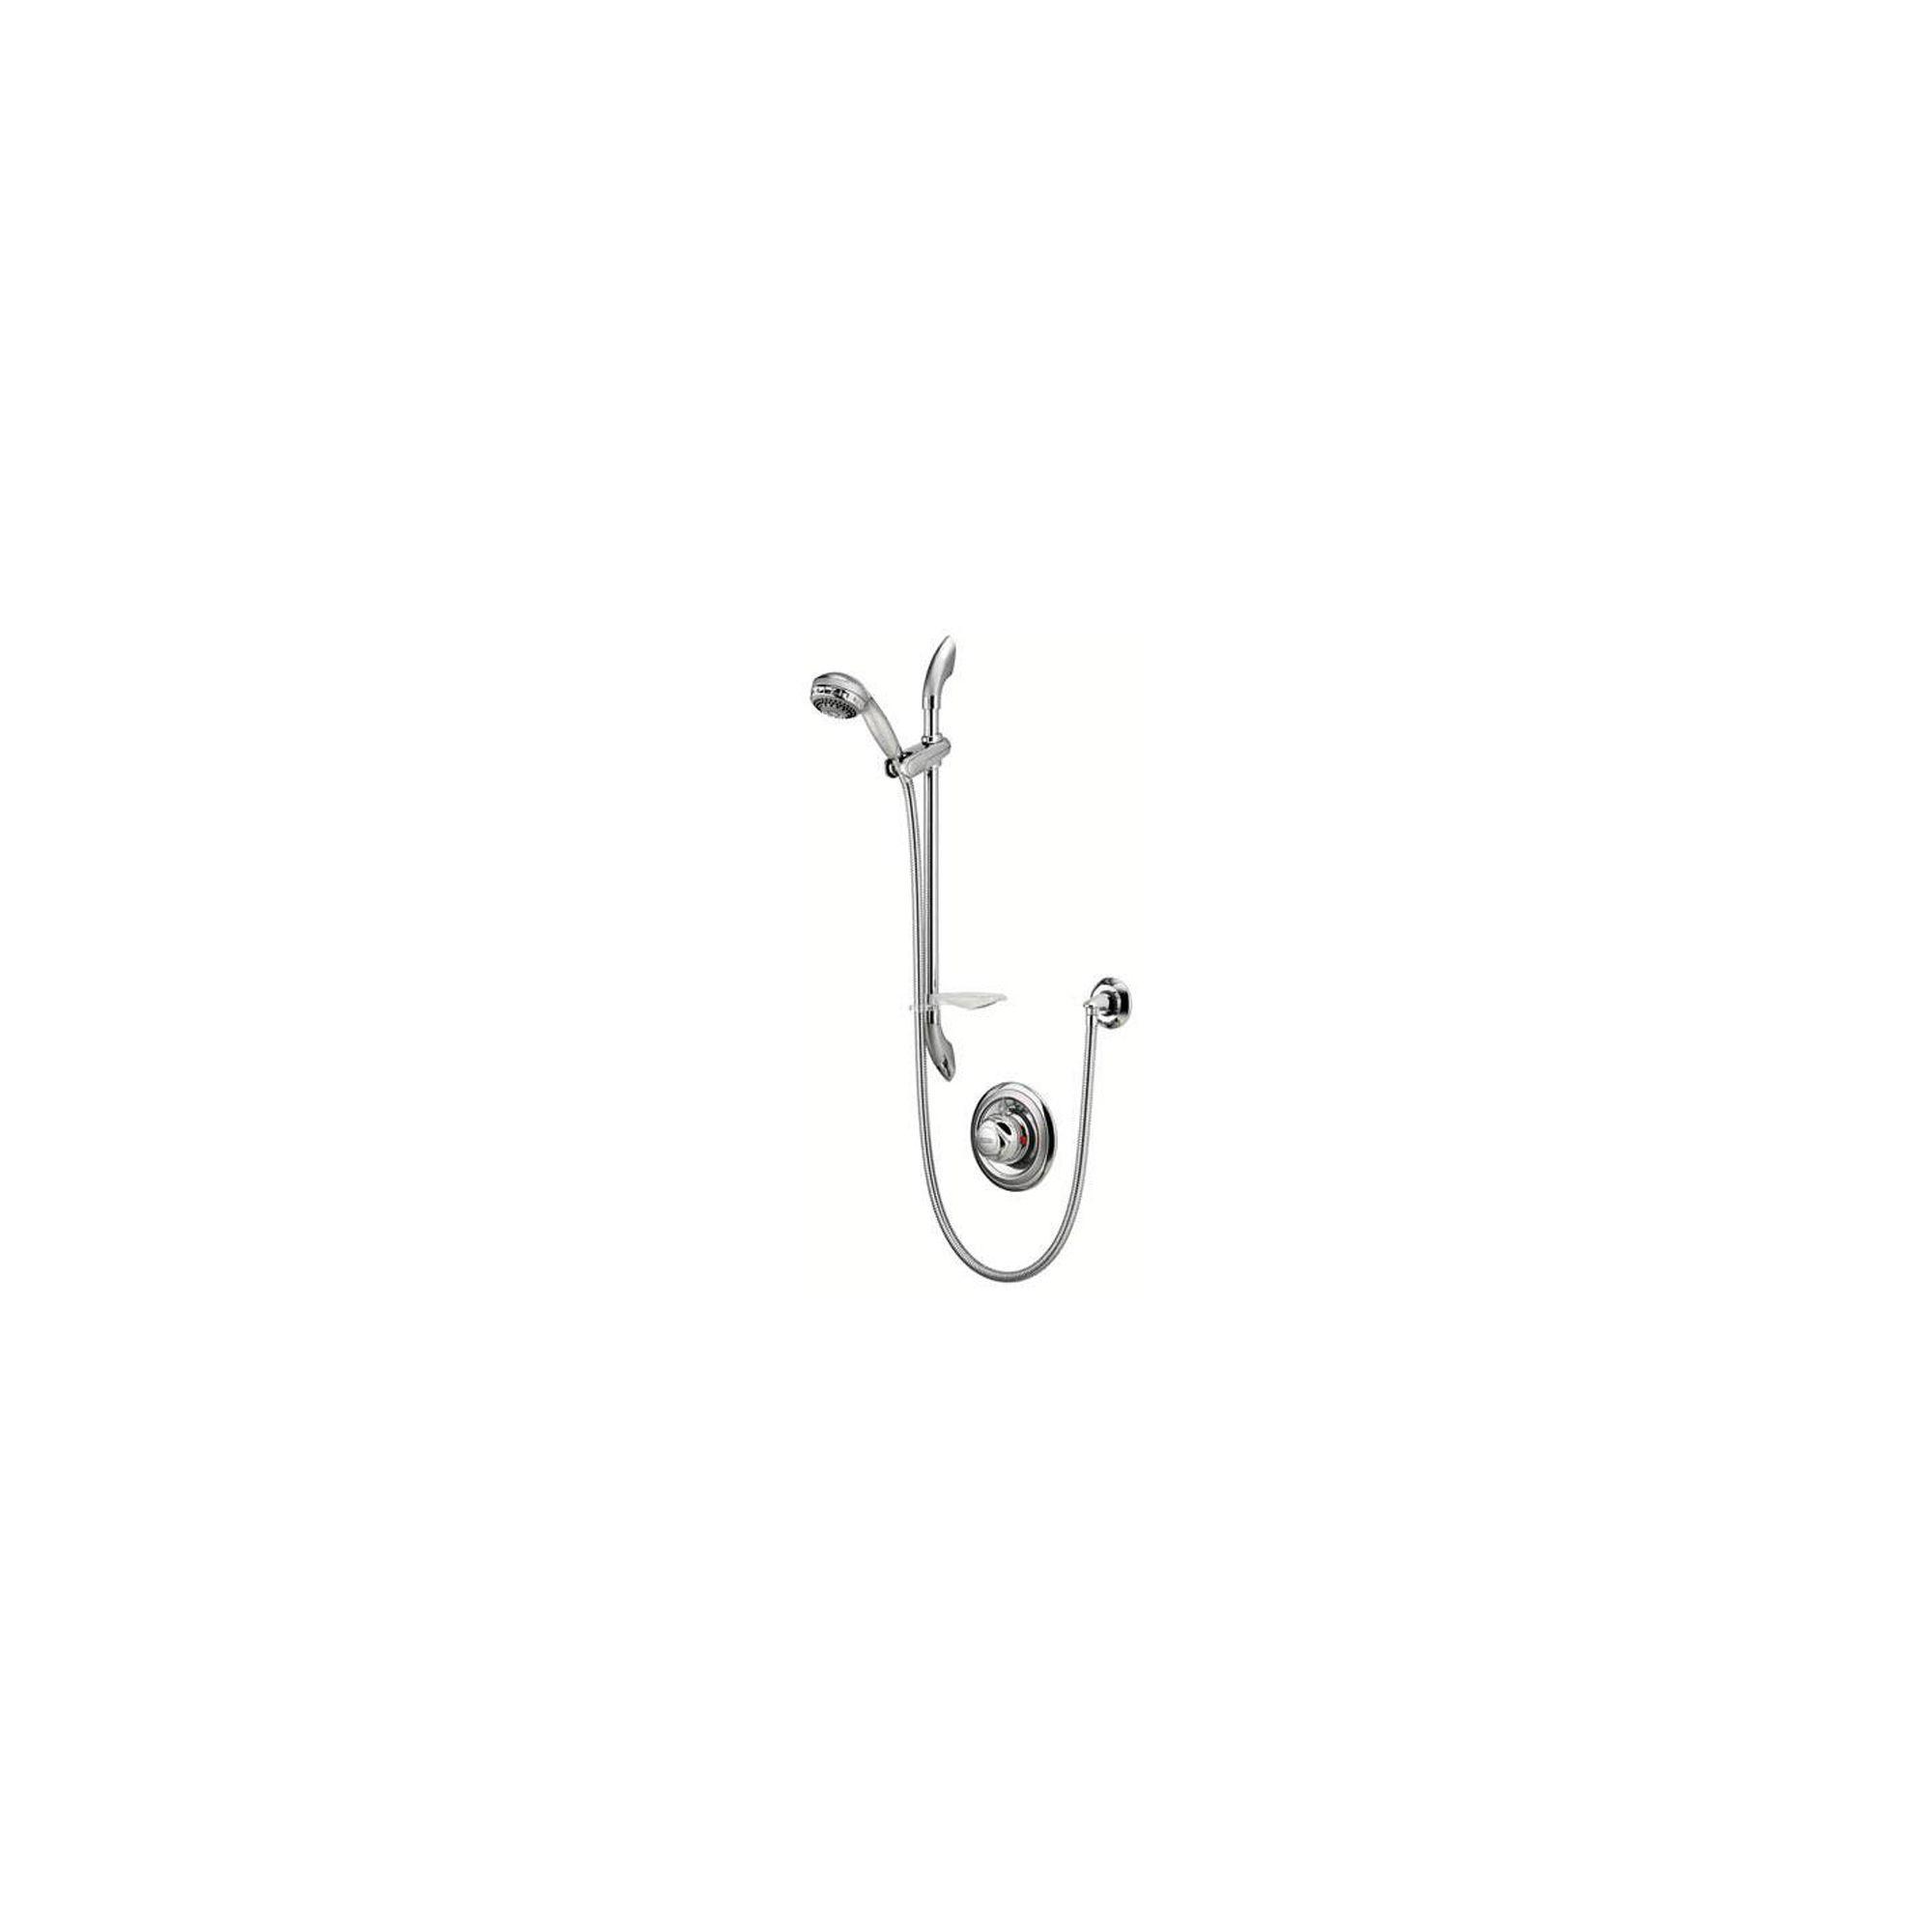 Aqualisa Aquavalve 609 Concealed Shower Valve with Adjustable Shower Head Chrome at Tesco Direct